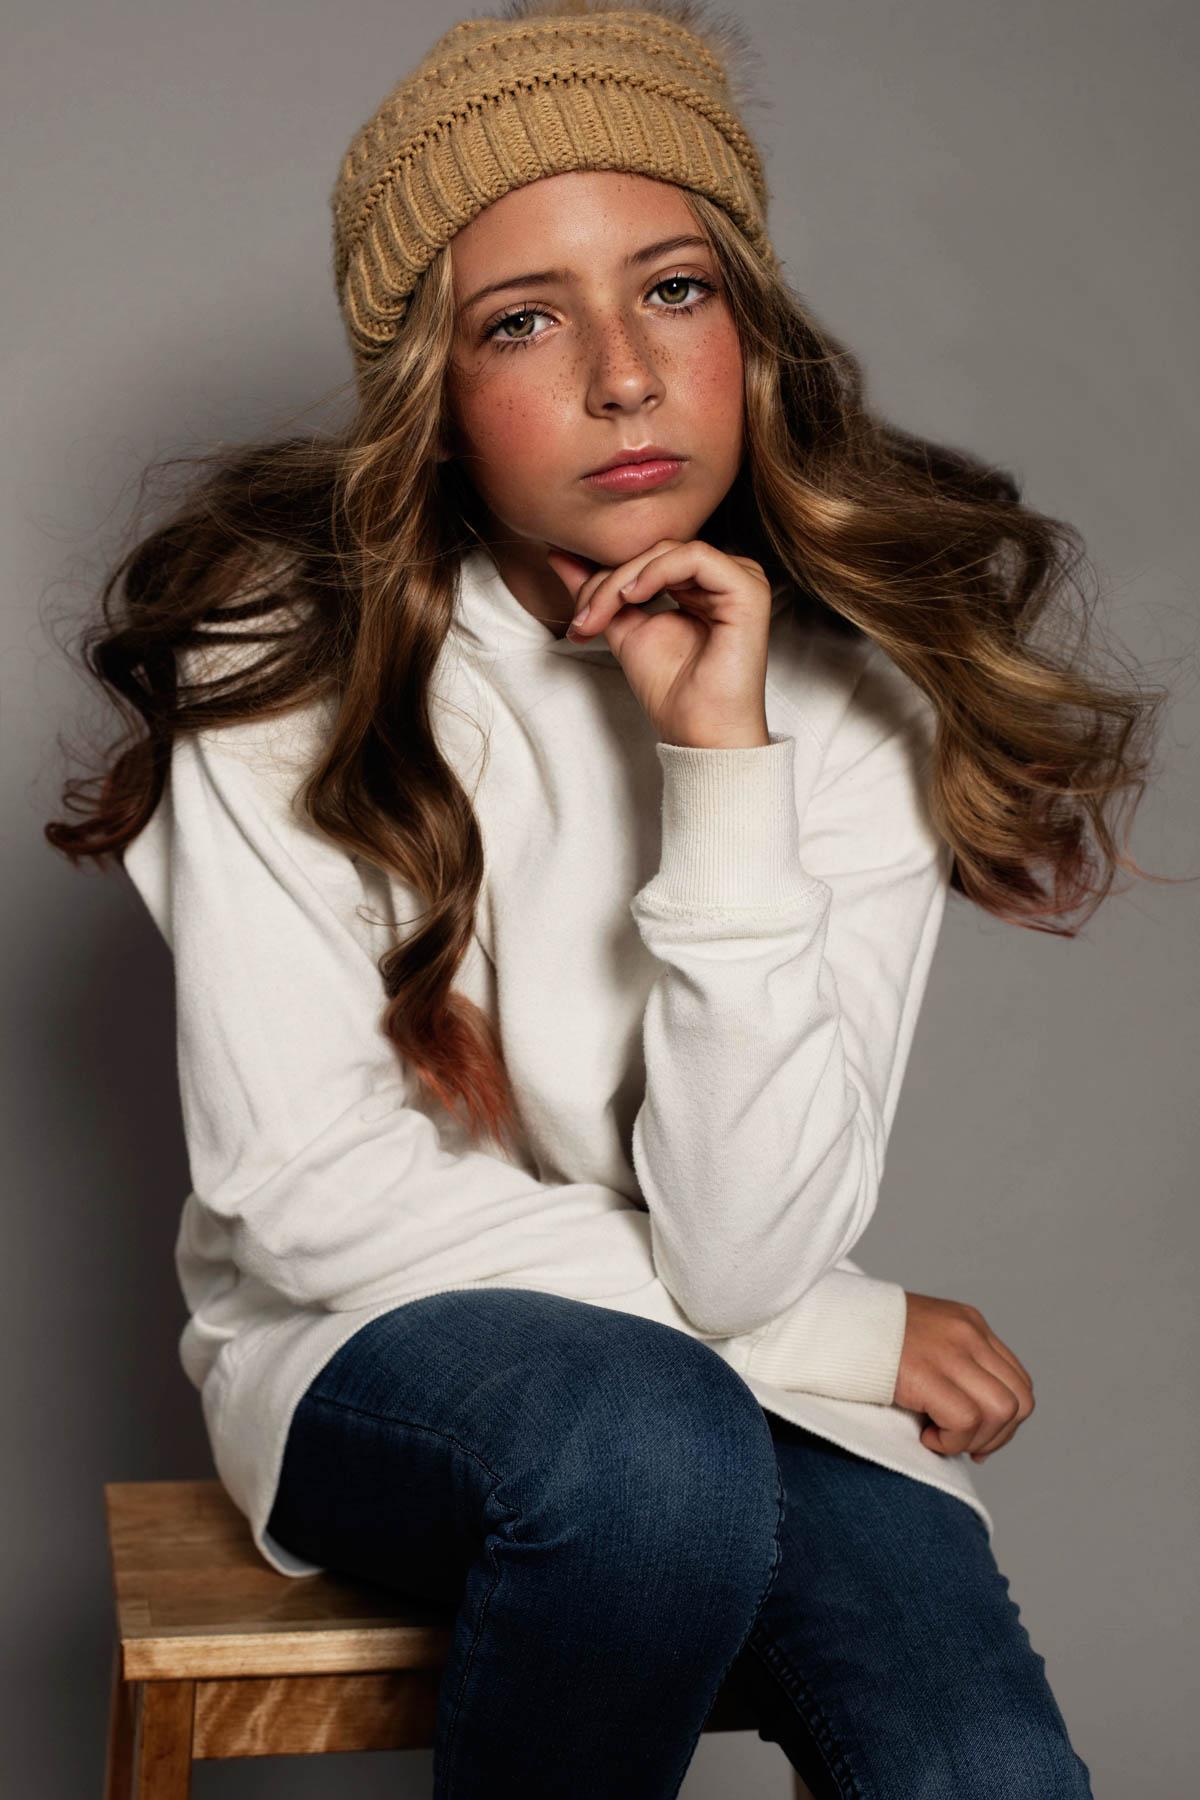 magazine worthy - contemporary - young girl - attitude - Asheville photography